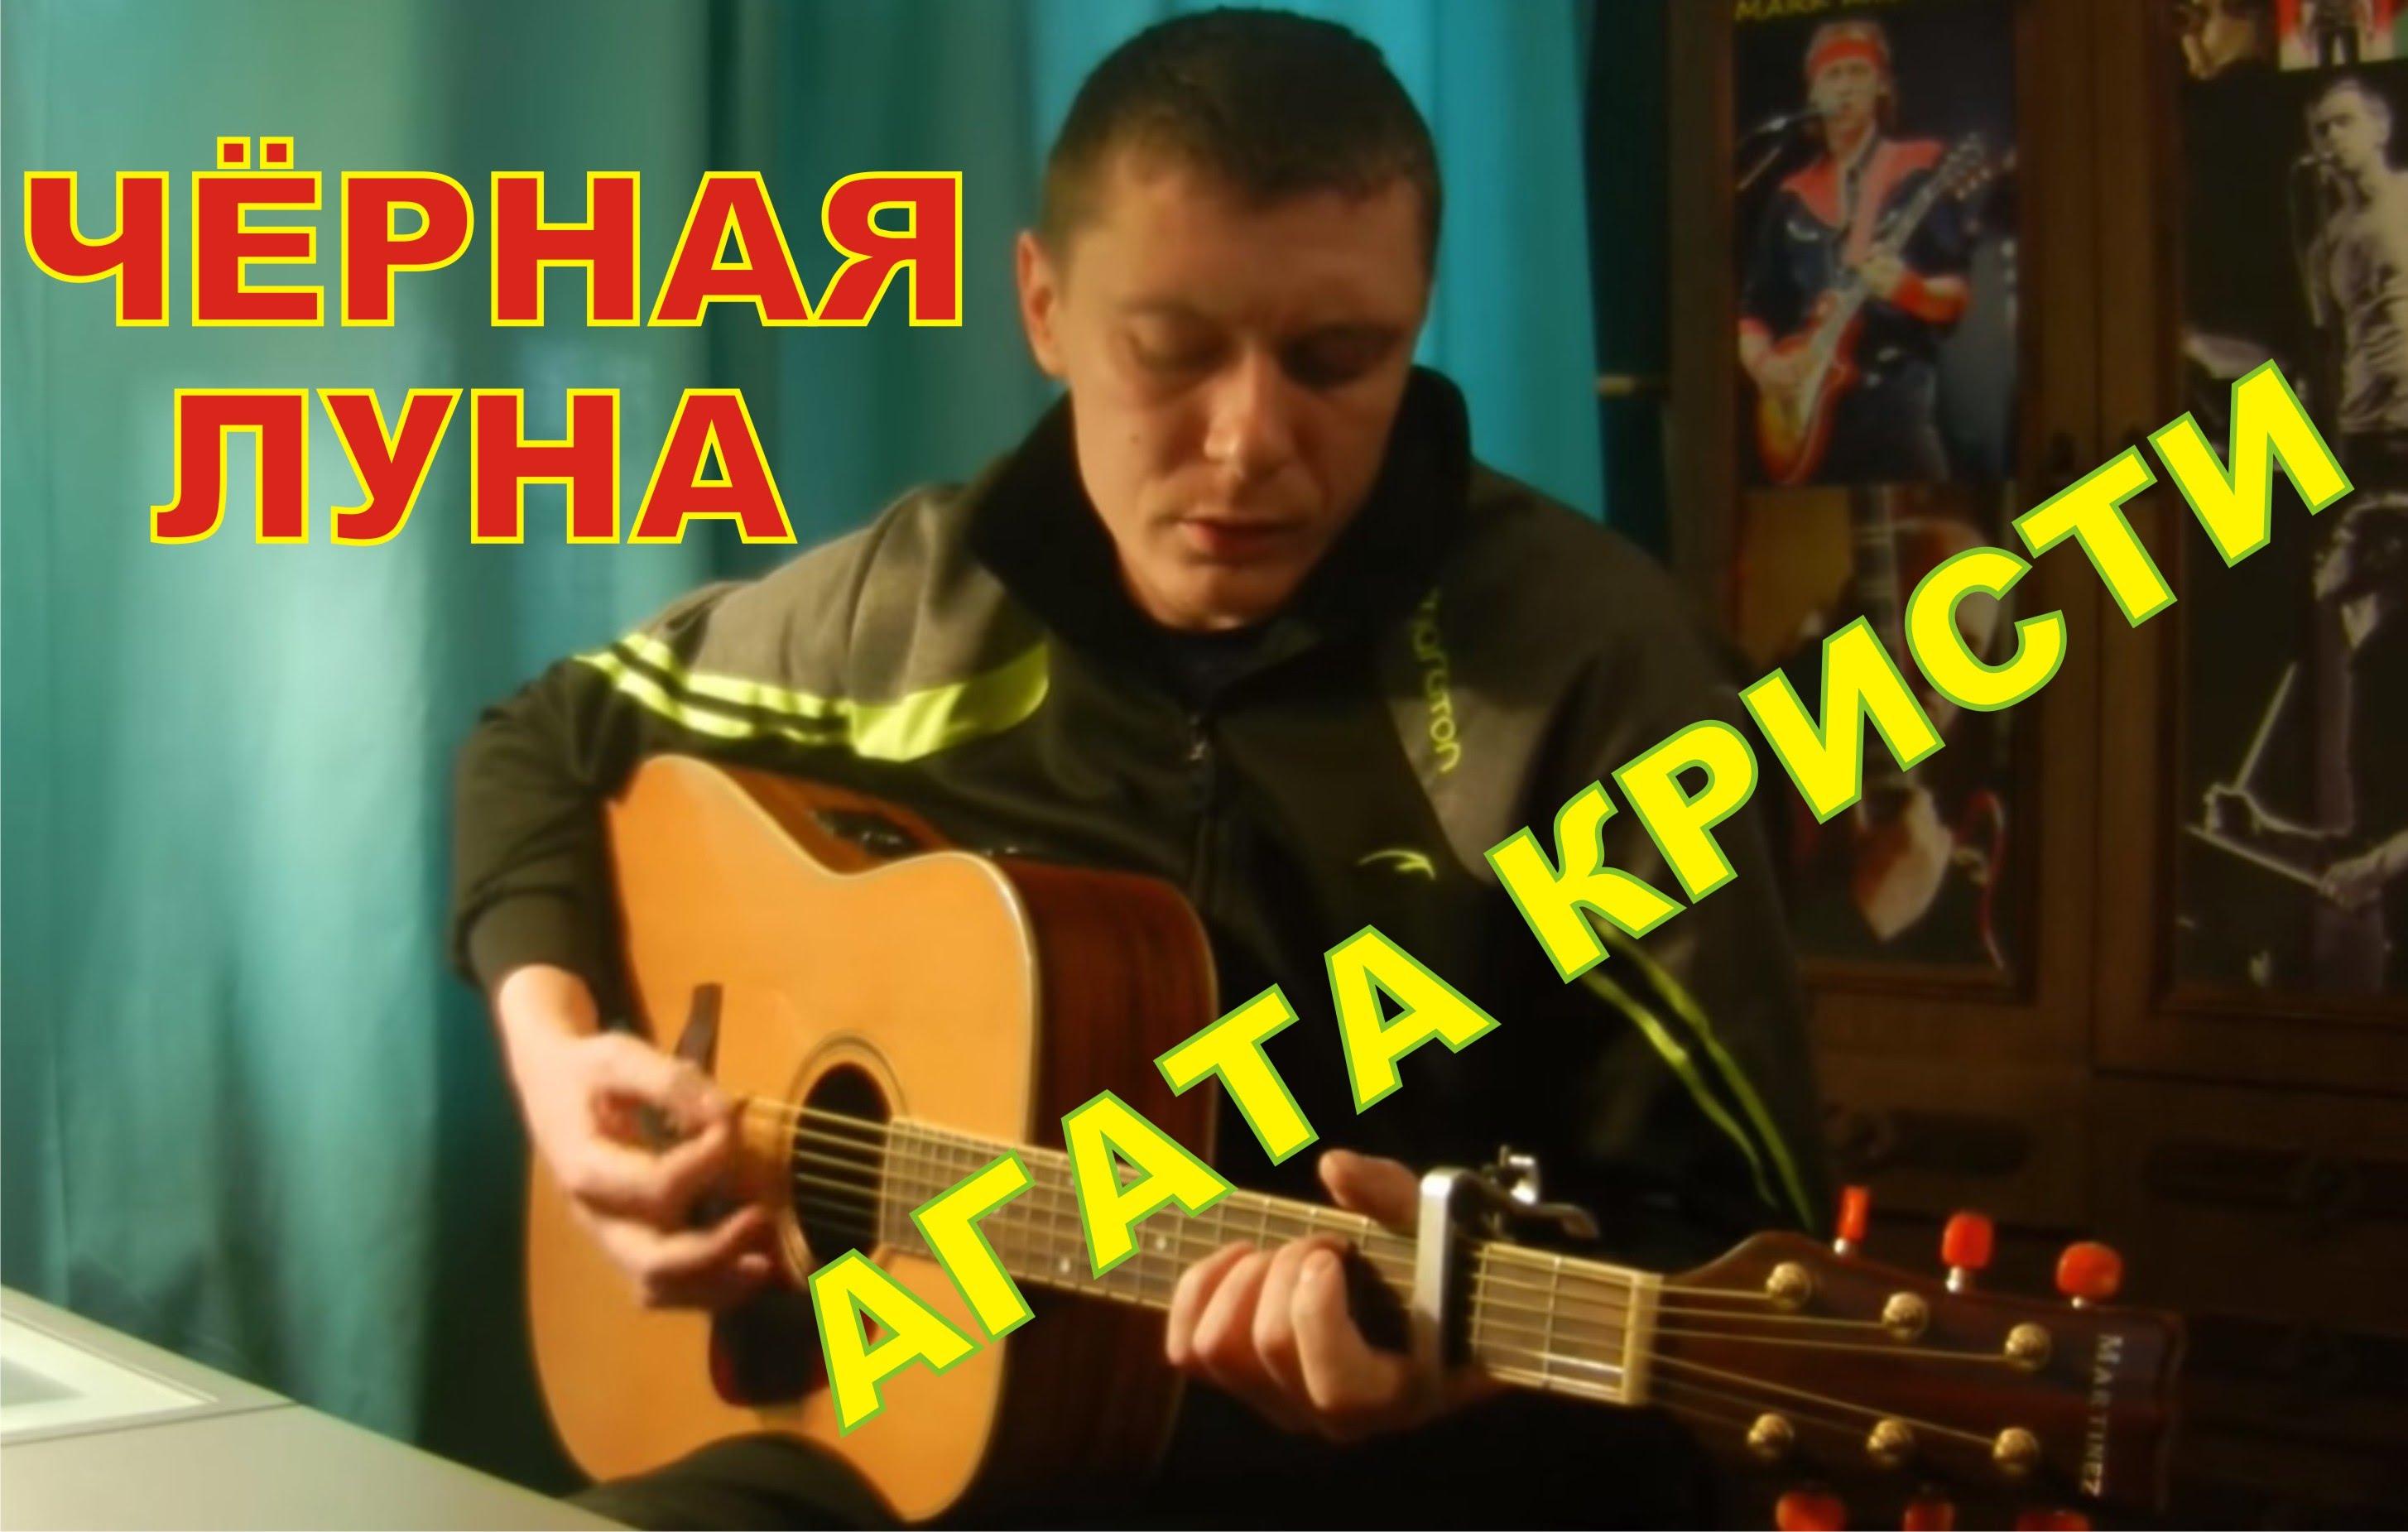 Агата Кристи — ЧРНАЯ ЛУНА (cover — Константин Сапрыкин)